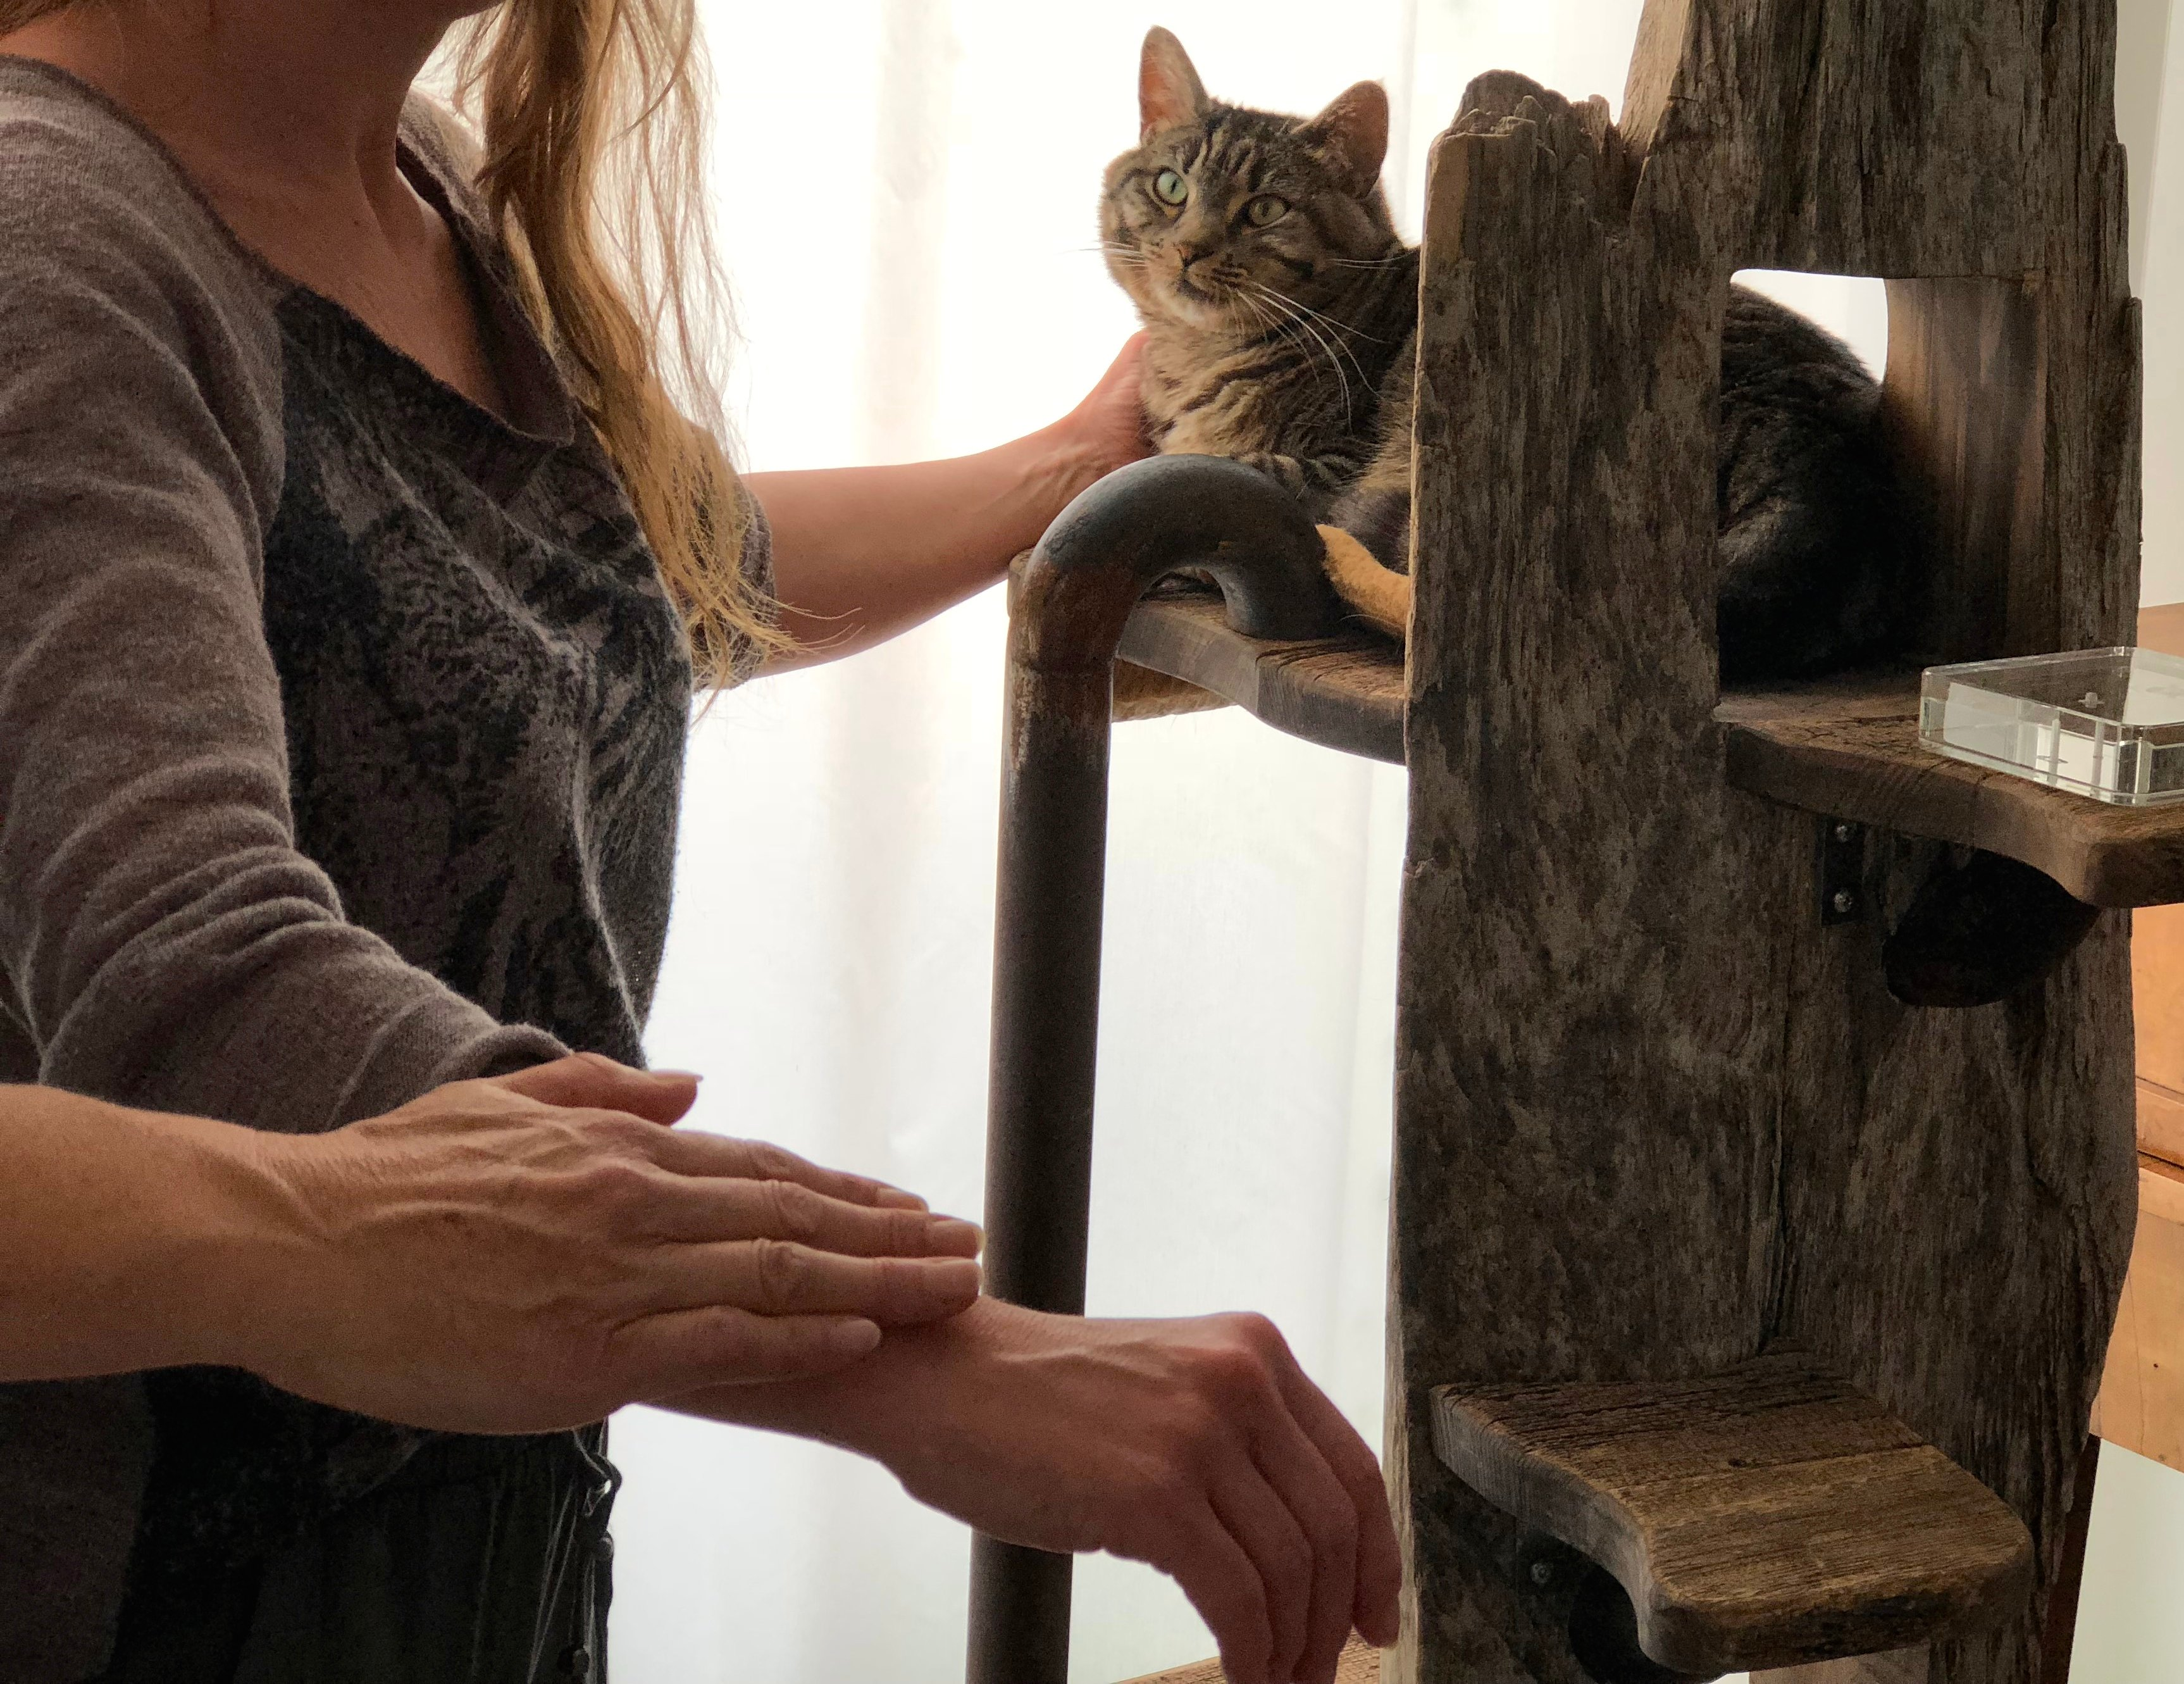 Mobile Tierarztpraxis - Kinesiologie / Verhaltensmedizin